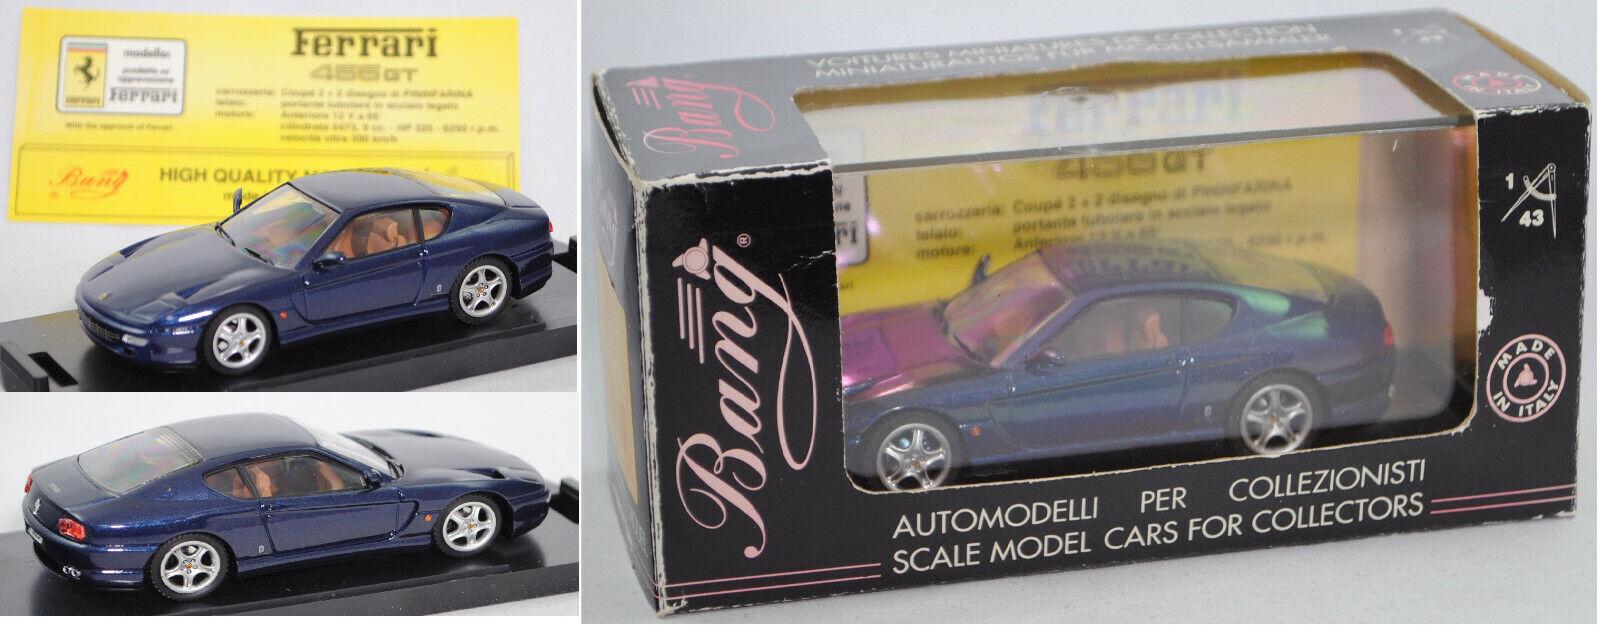 Revell 8015 Ferrari 456 GT (Design  Pininfarina), blue, 1 43